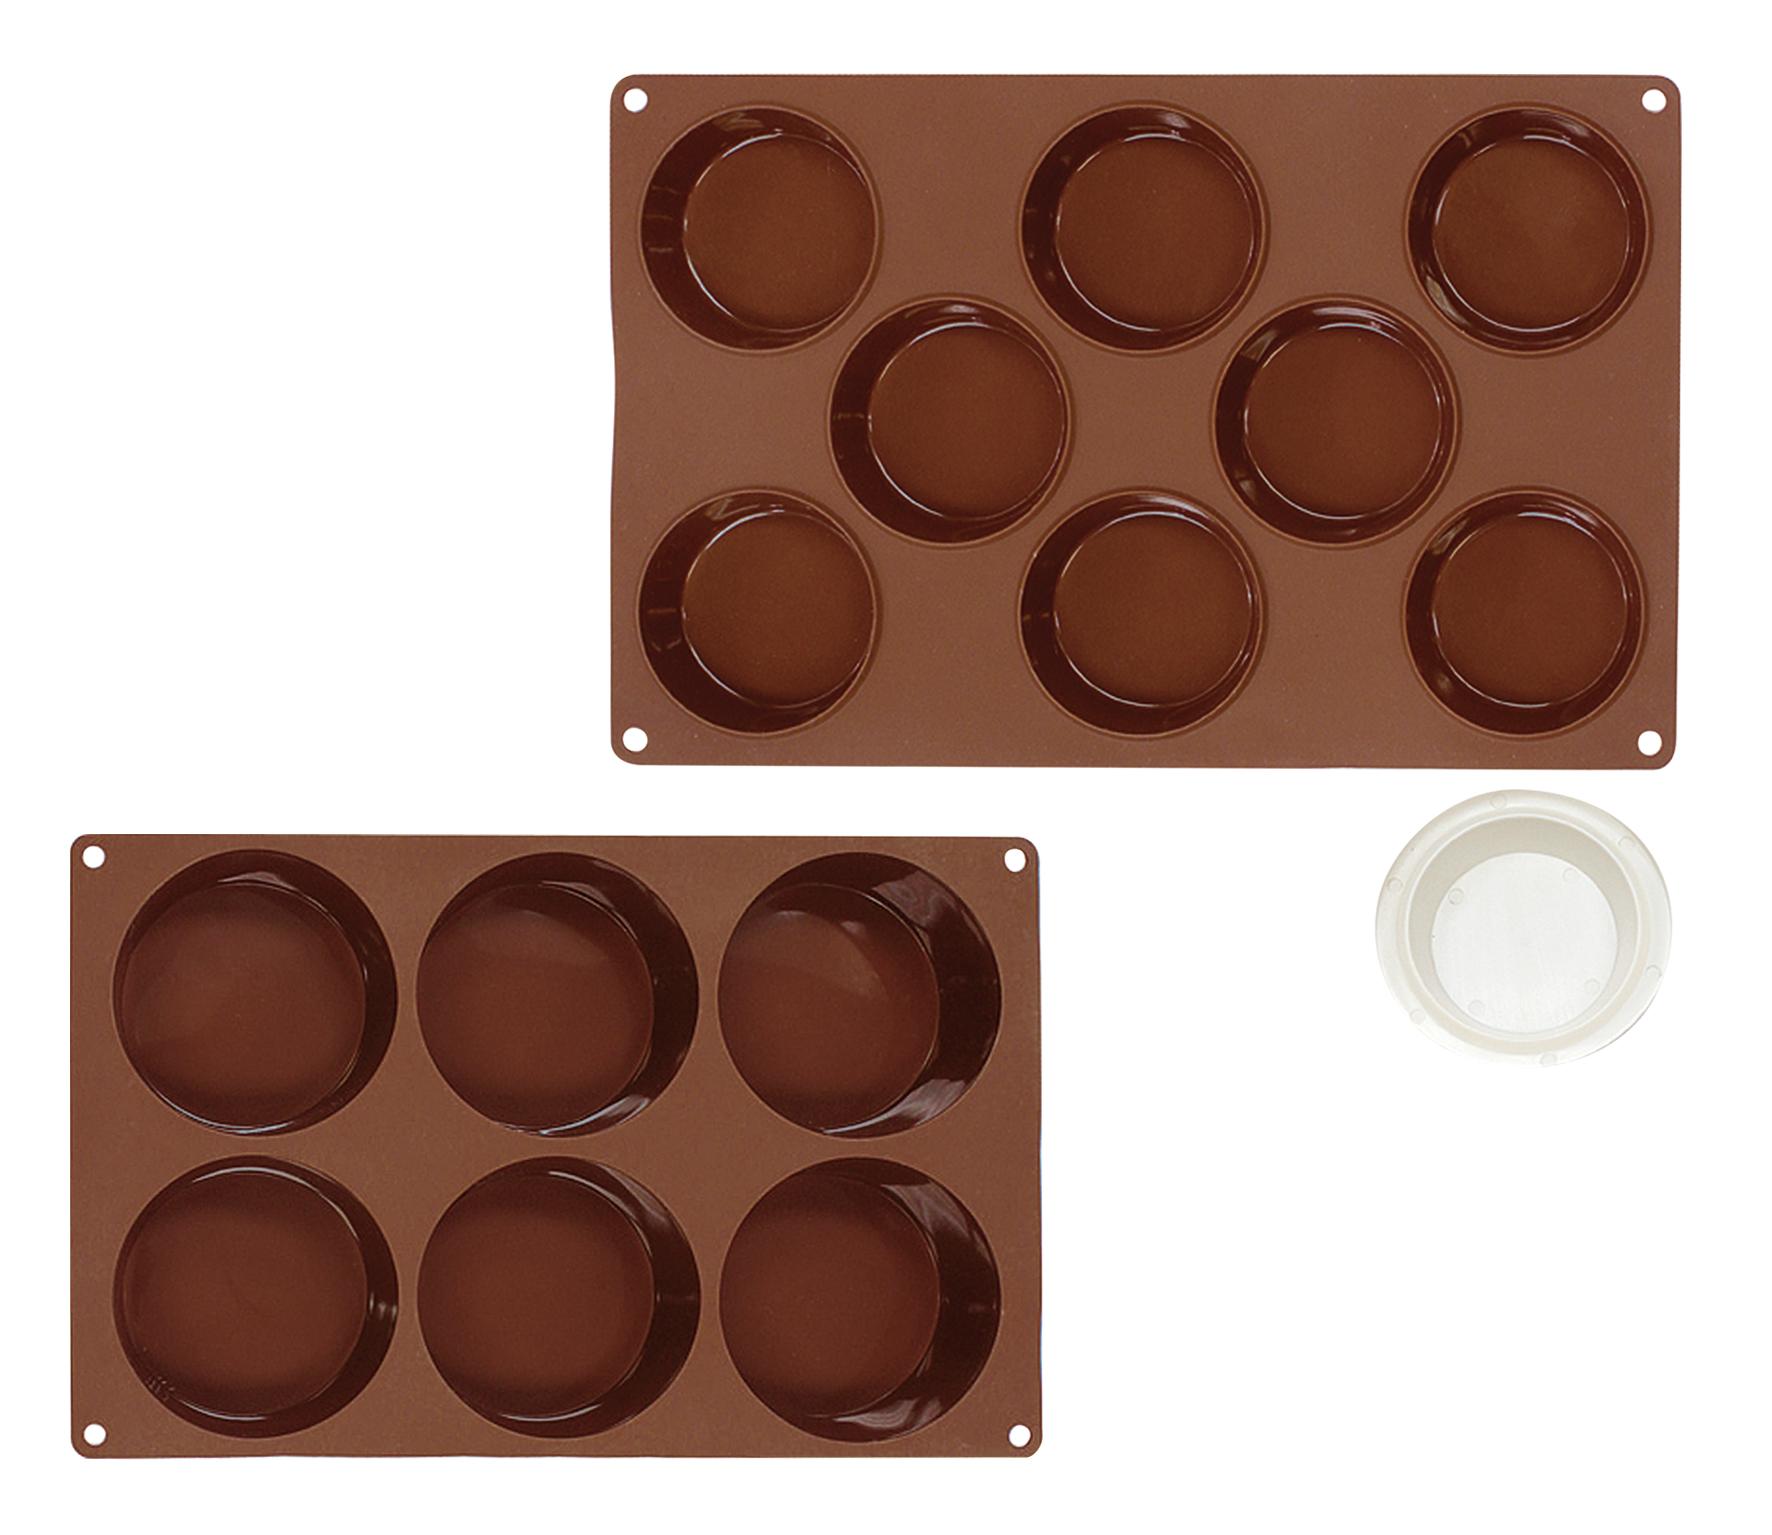 Küchenprofi Tartelettes-Set Pâtissier, 2-tlg. Patissier 0805075500 Tarteform - 805075500